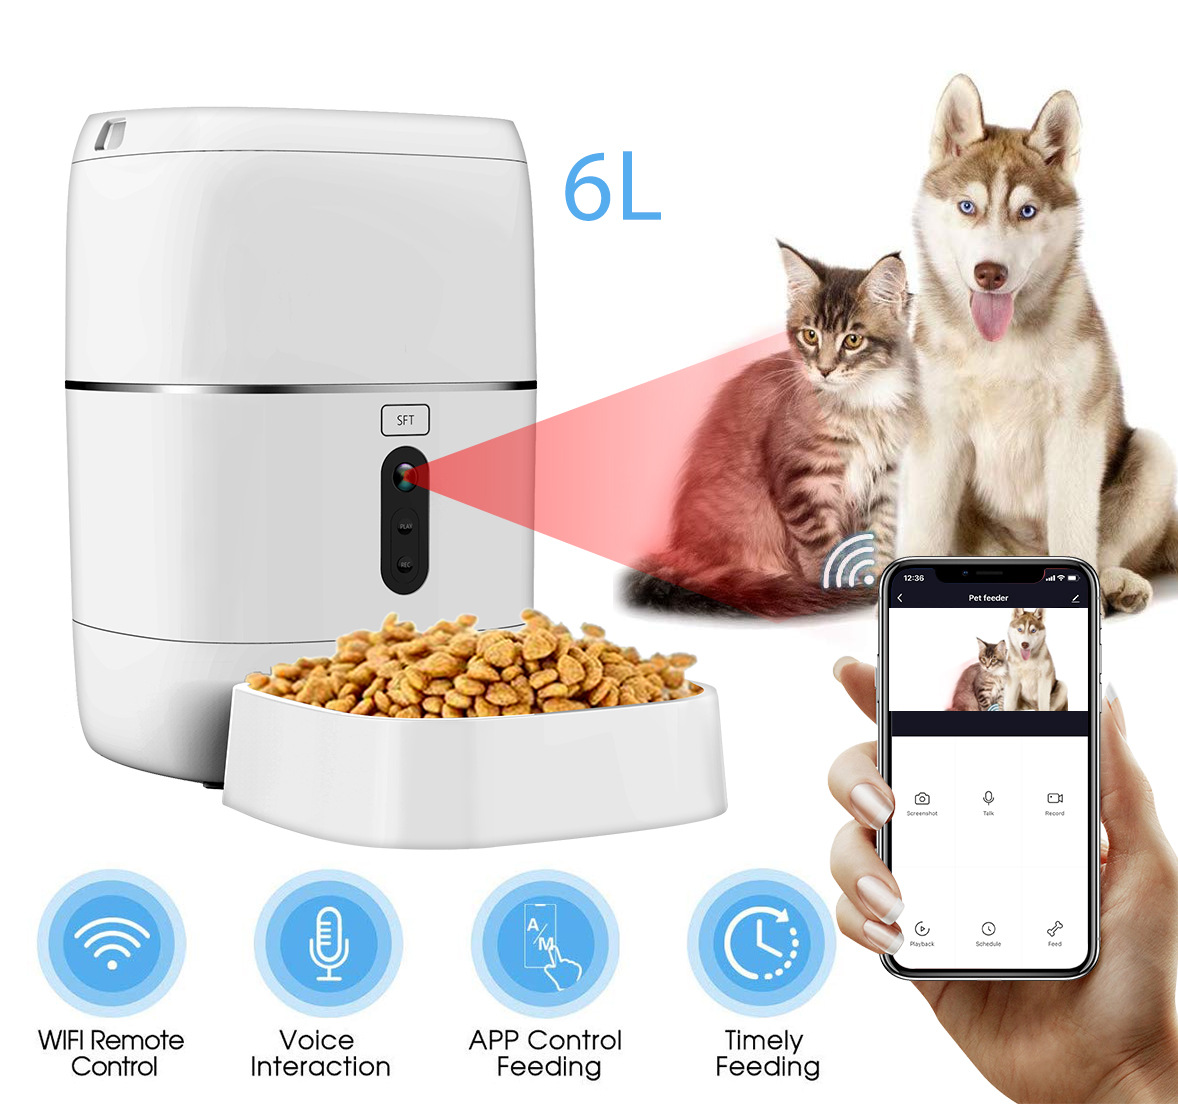 Tuya Smart Wifi Automatic Pet Feeder Food Dispenser For Cats Dogs Buy Pet Feeder Pet Feeder Automatic Pet Feeder Product On Alibaba Com